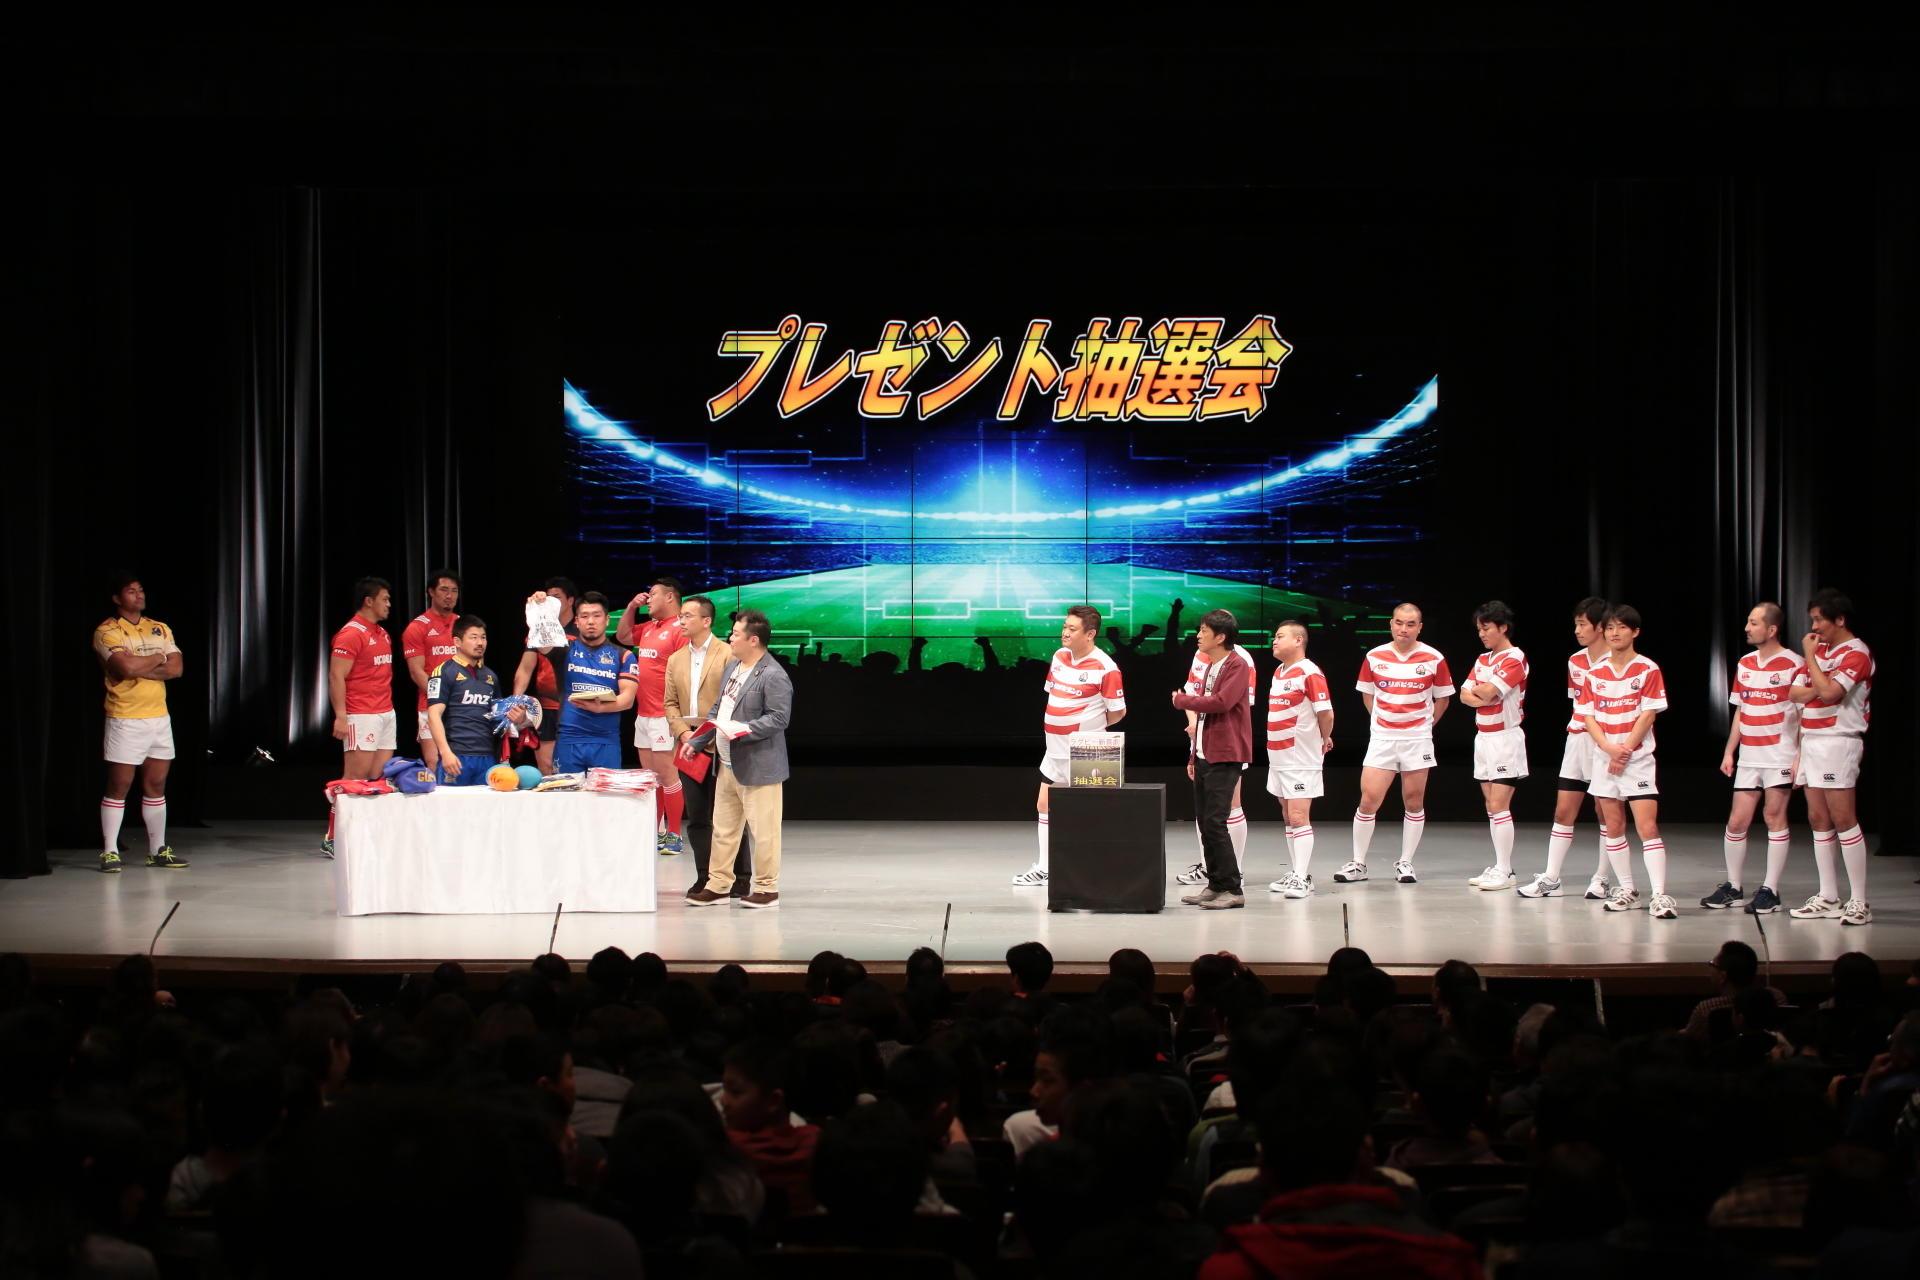 http://news.yoshimoto.co.jp/20160118175529-6d6c5d2d5a5a209d65b330048f879242bcc0fbdc.jpg